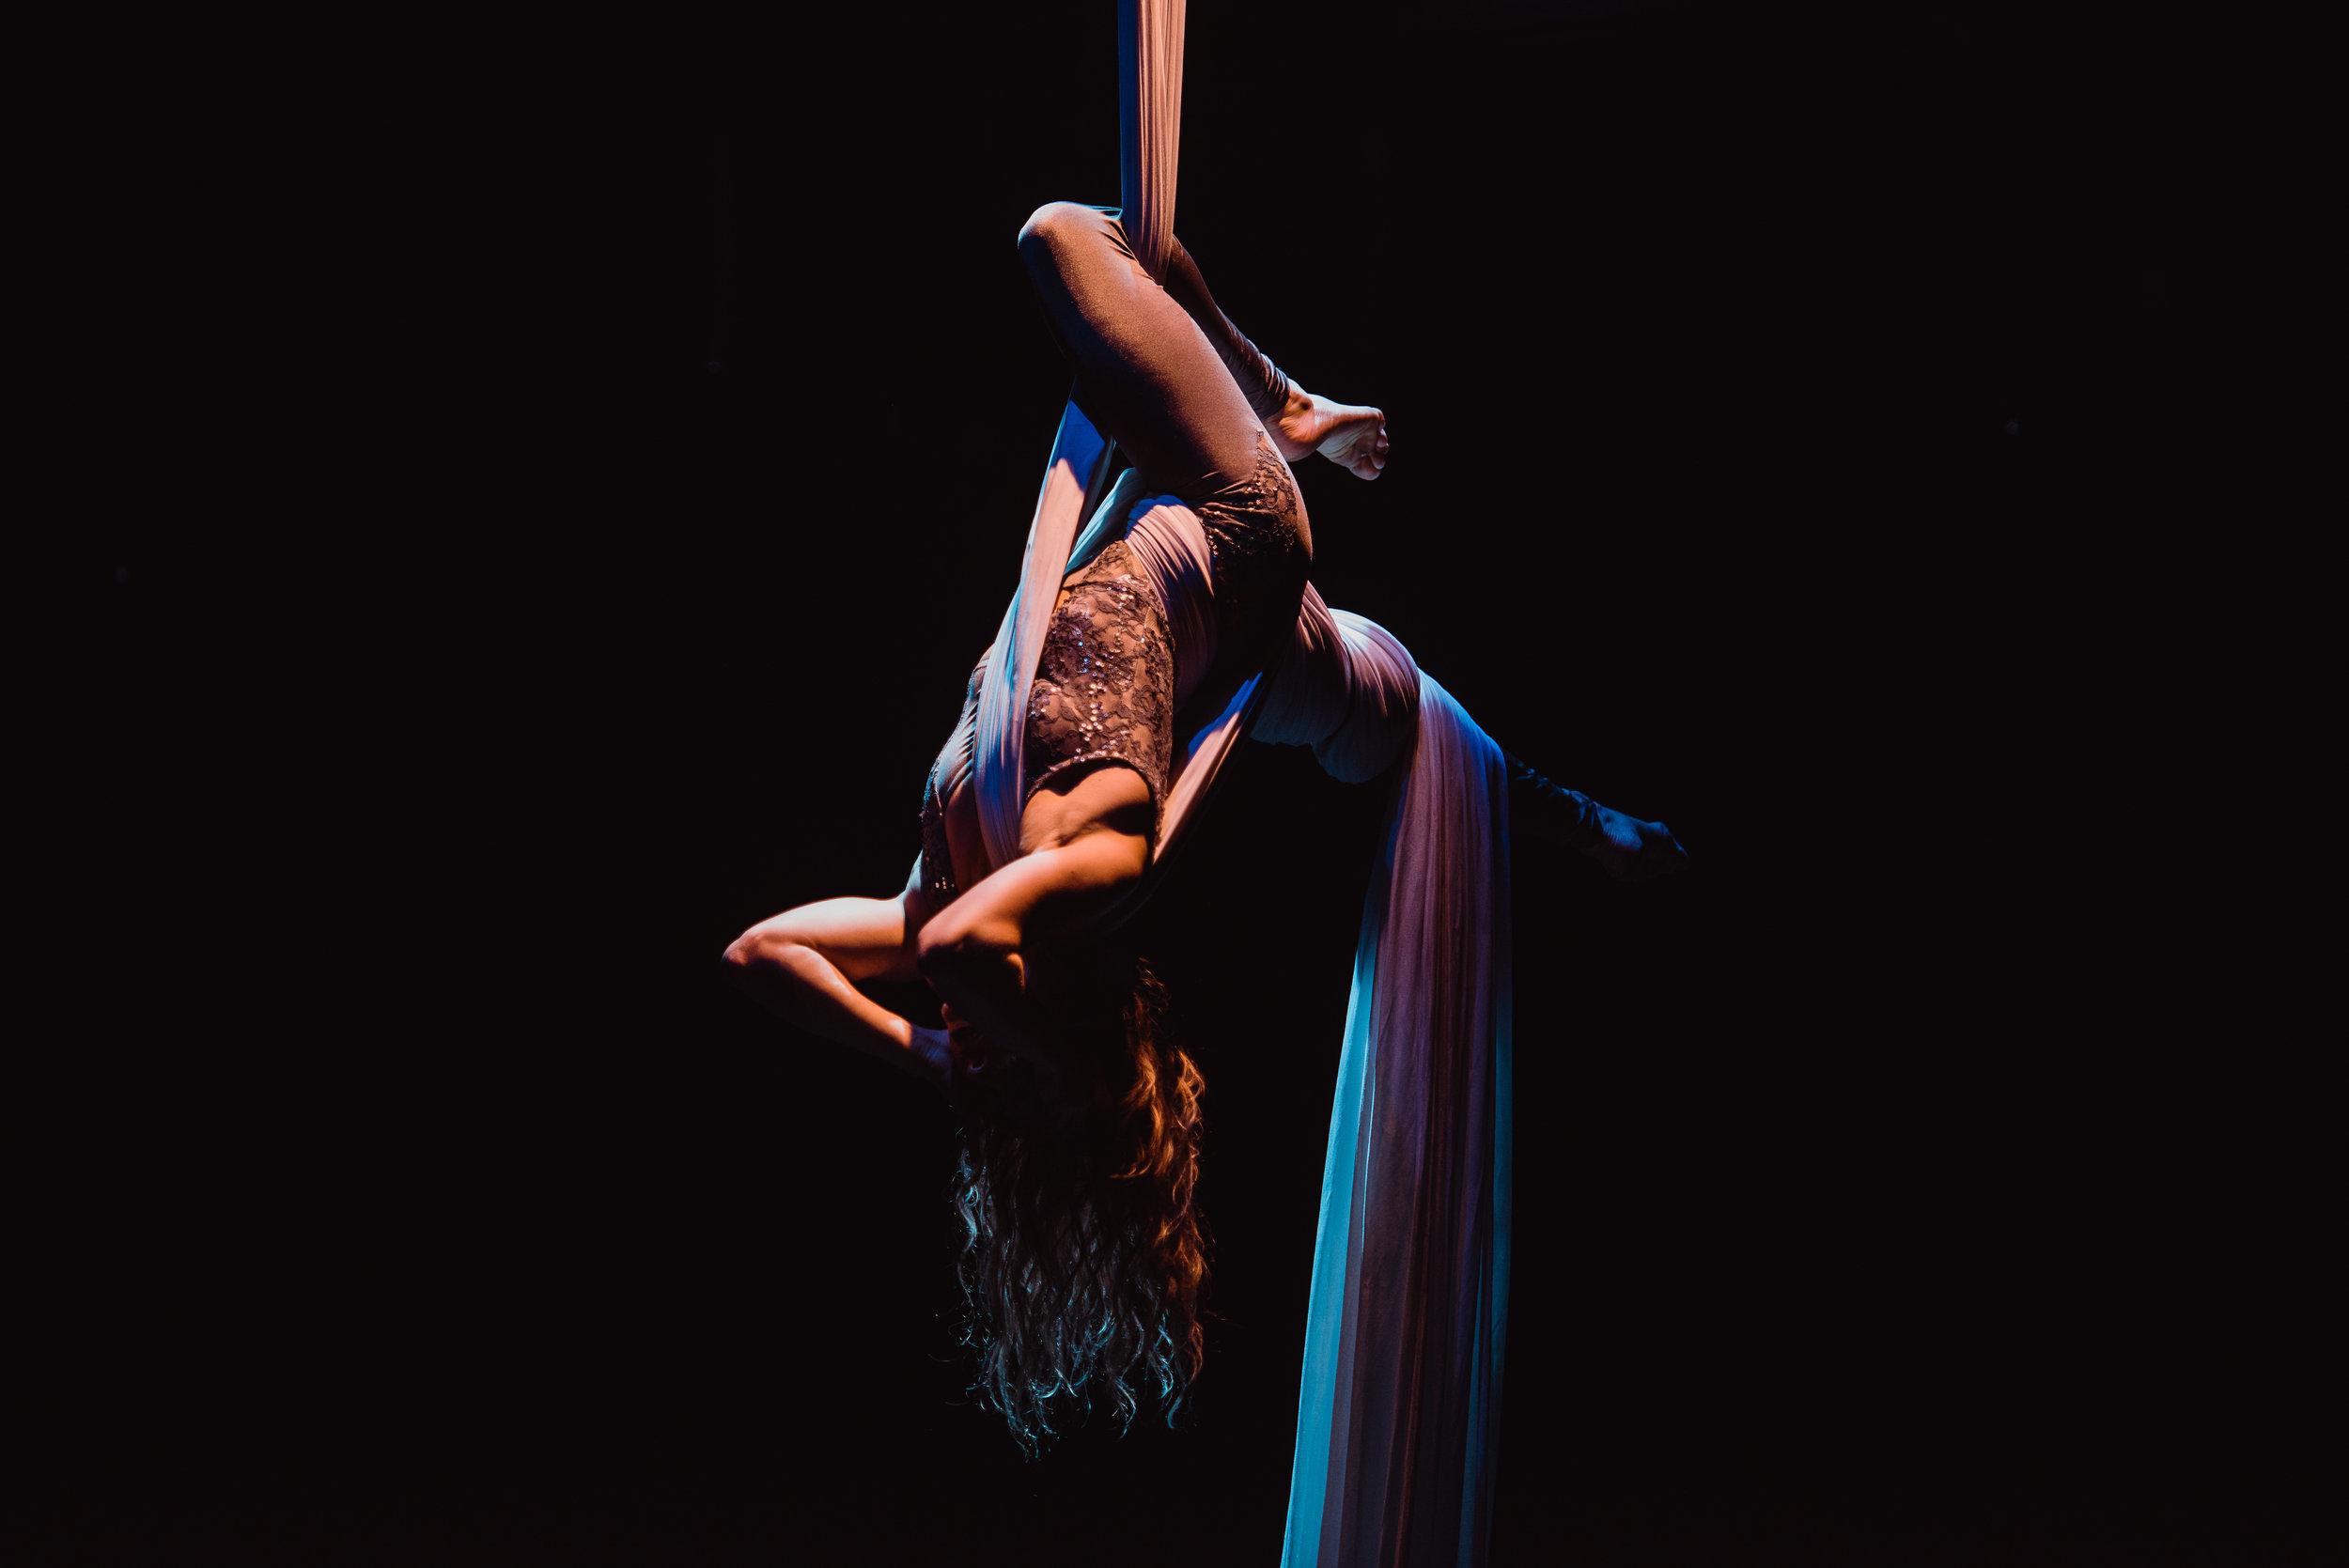 Jessica Aerial Silks